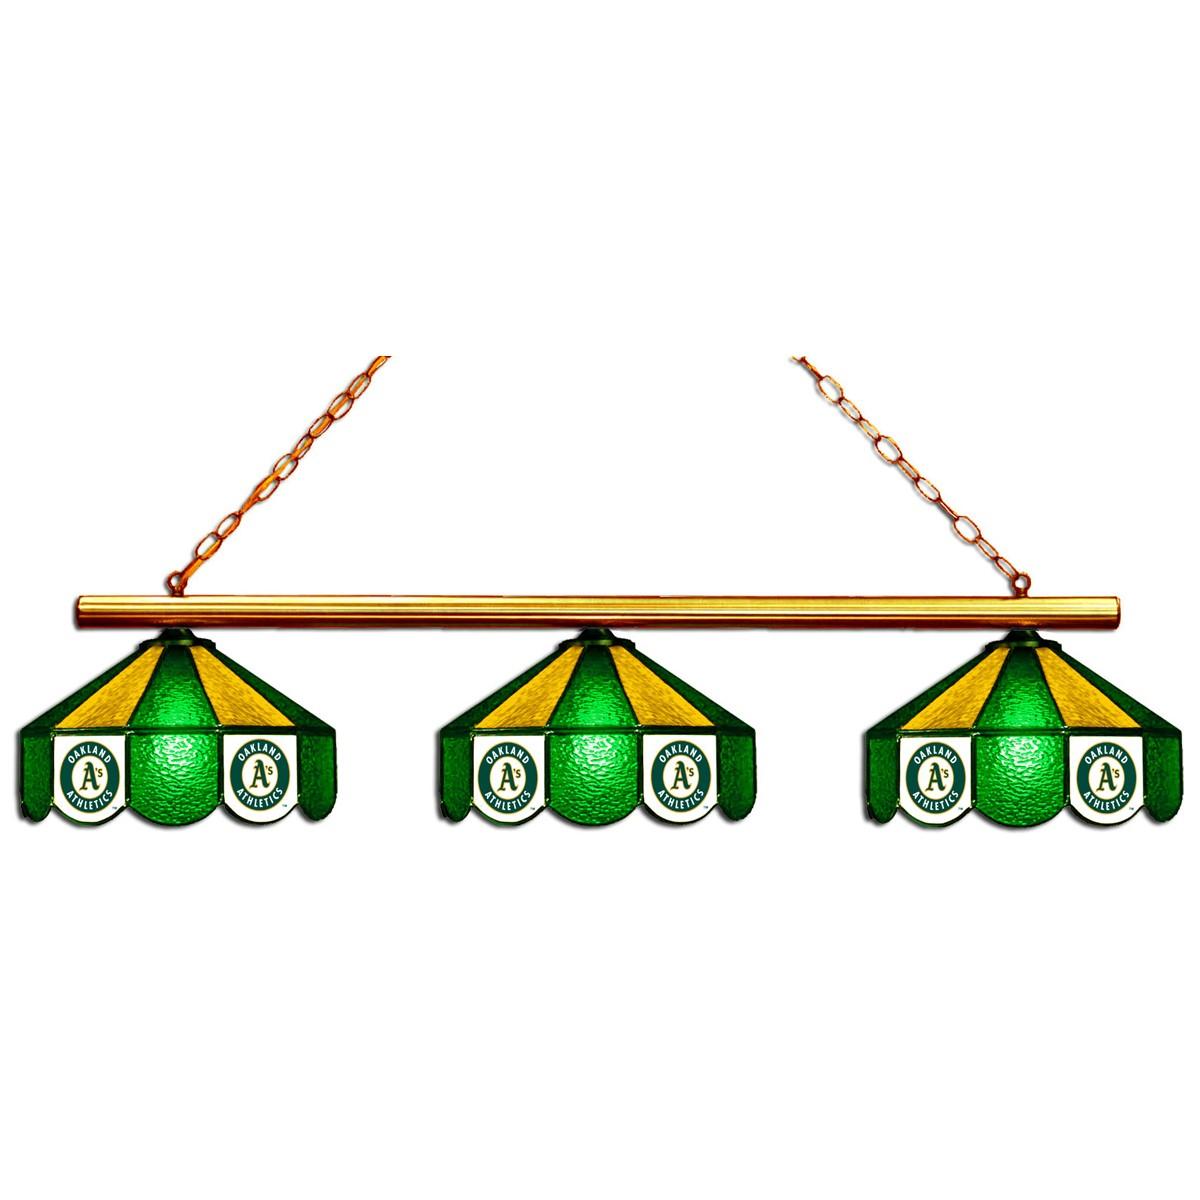 OAKLAND ATHLETICS 3 SHADE GLASS LAMP